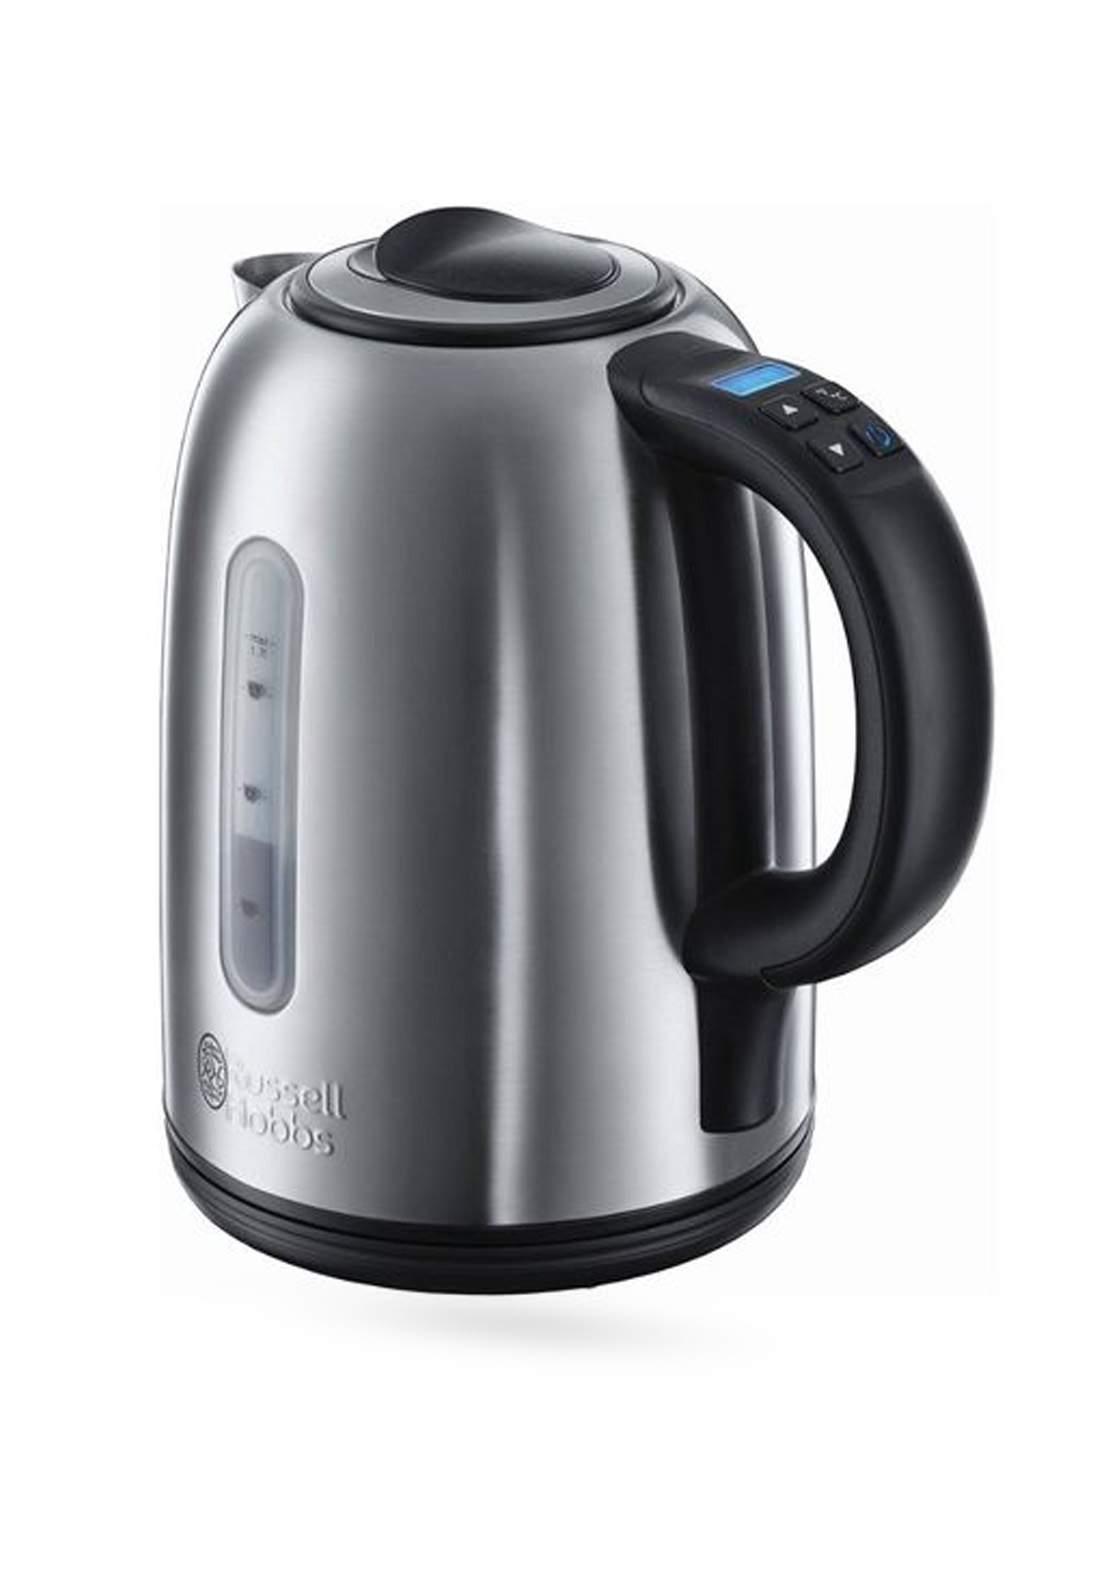 Russell hobbs 21040  Electrical kettle  غلاية